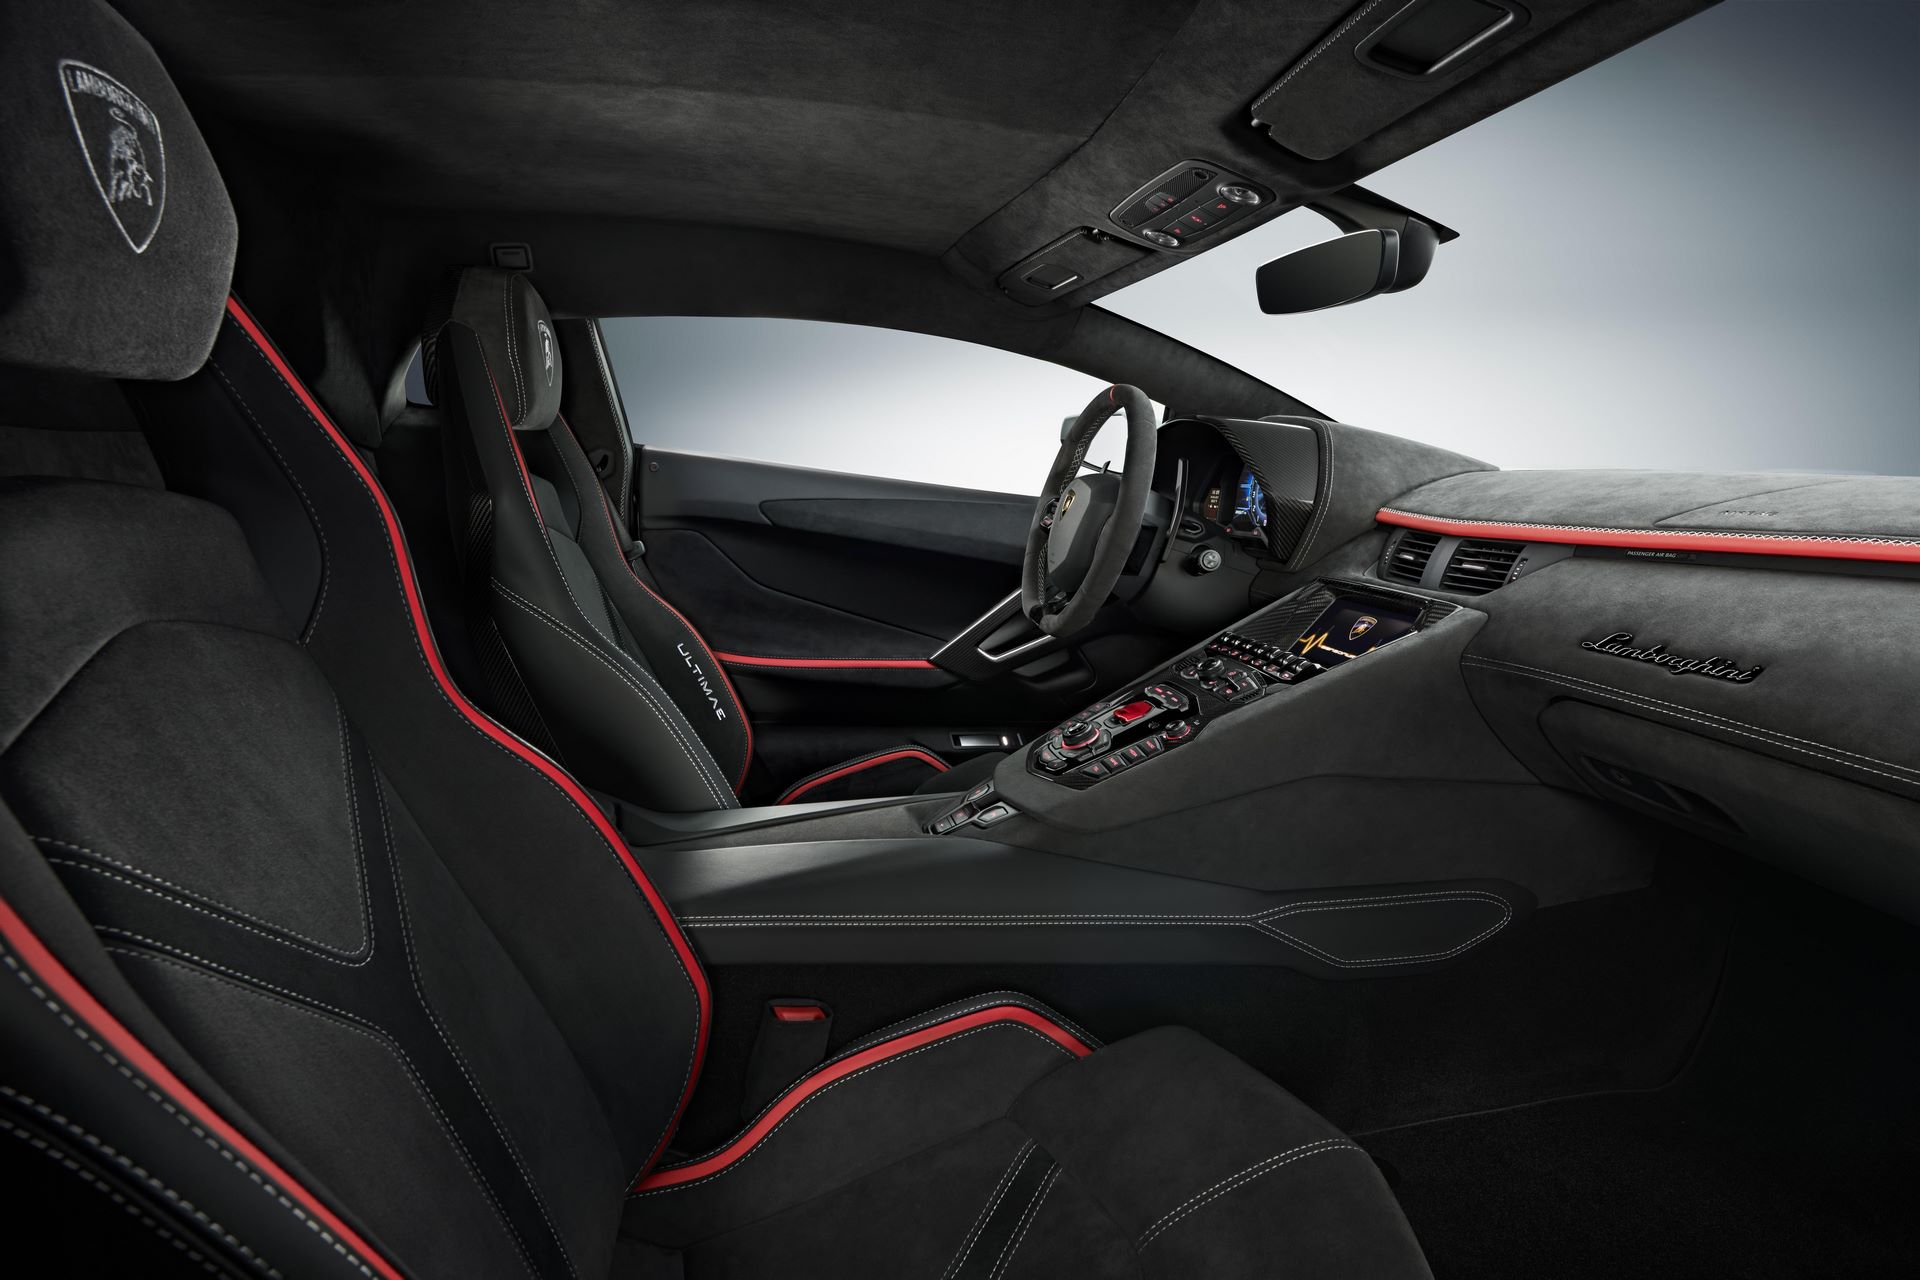 Lamborghini-Aventador-LP780-4-Ultimae-47